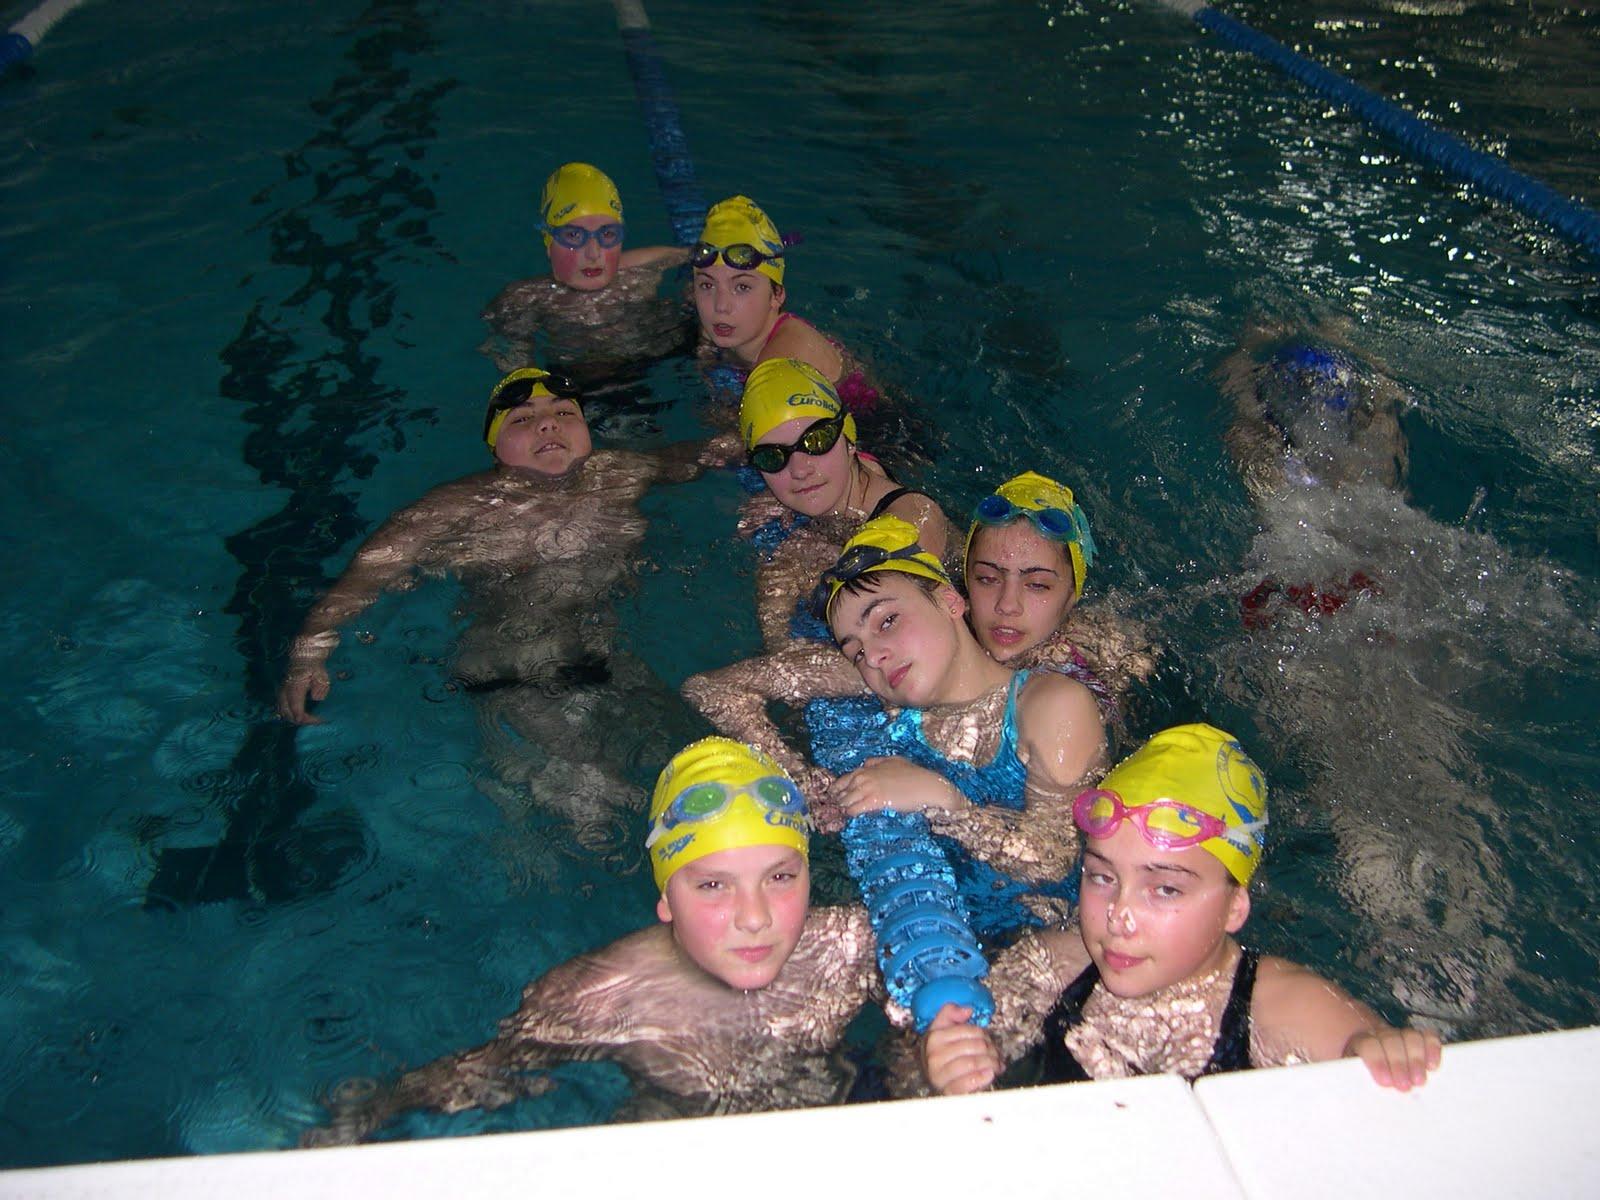 Club nataci n arroaz fene abril 2010 for Piscina de naron